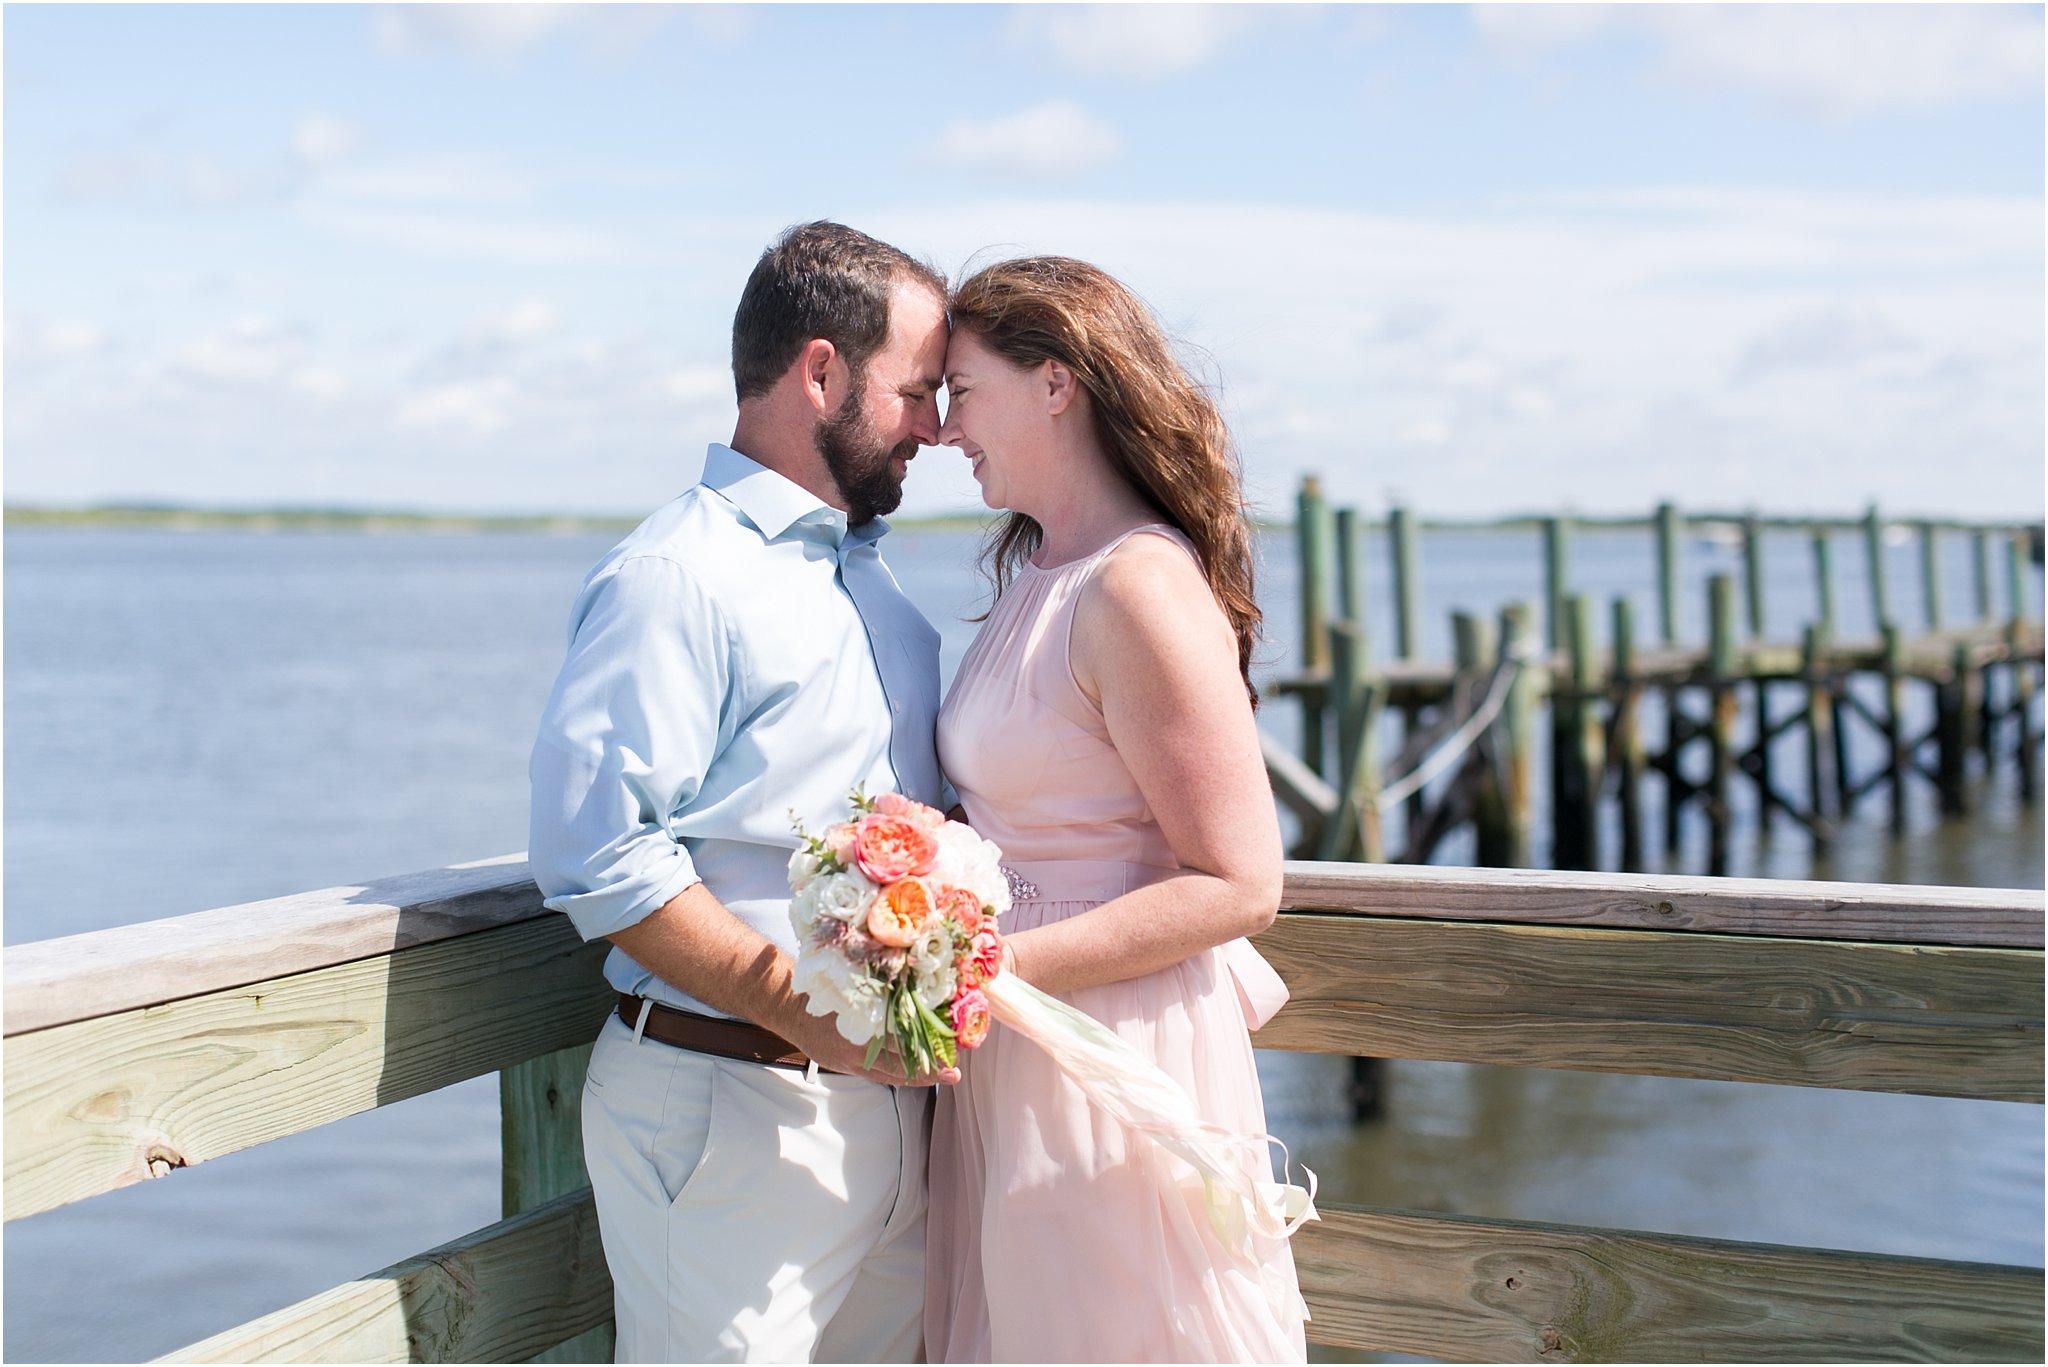 jessica_ryan_photography_wedding_photographs_virginia_fernandina_beach_florida_wedding_2114